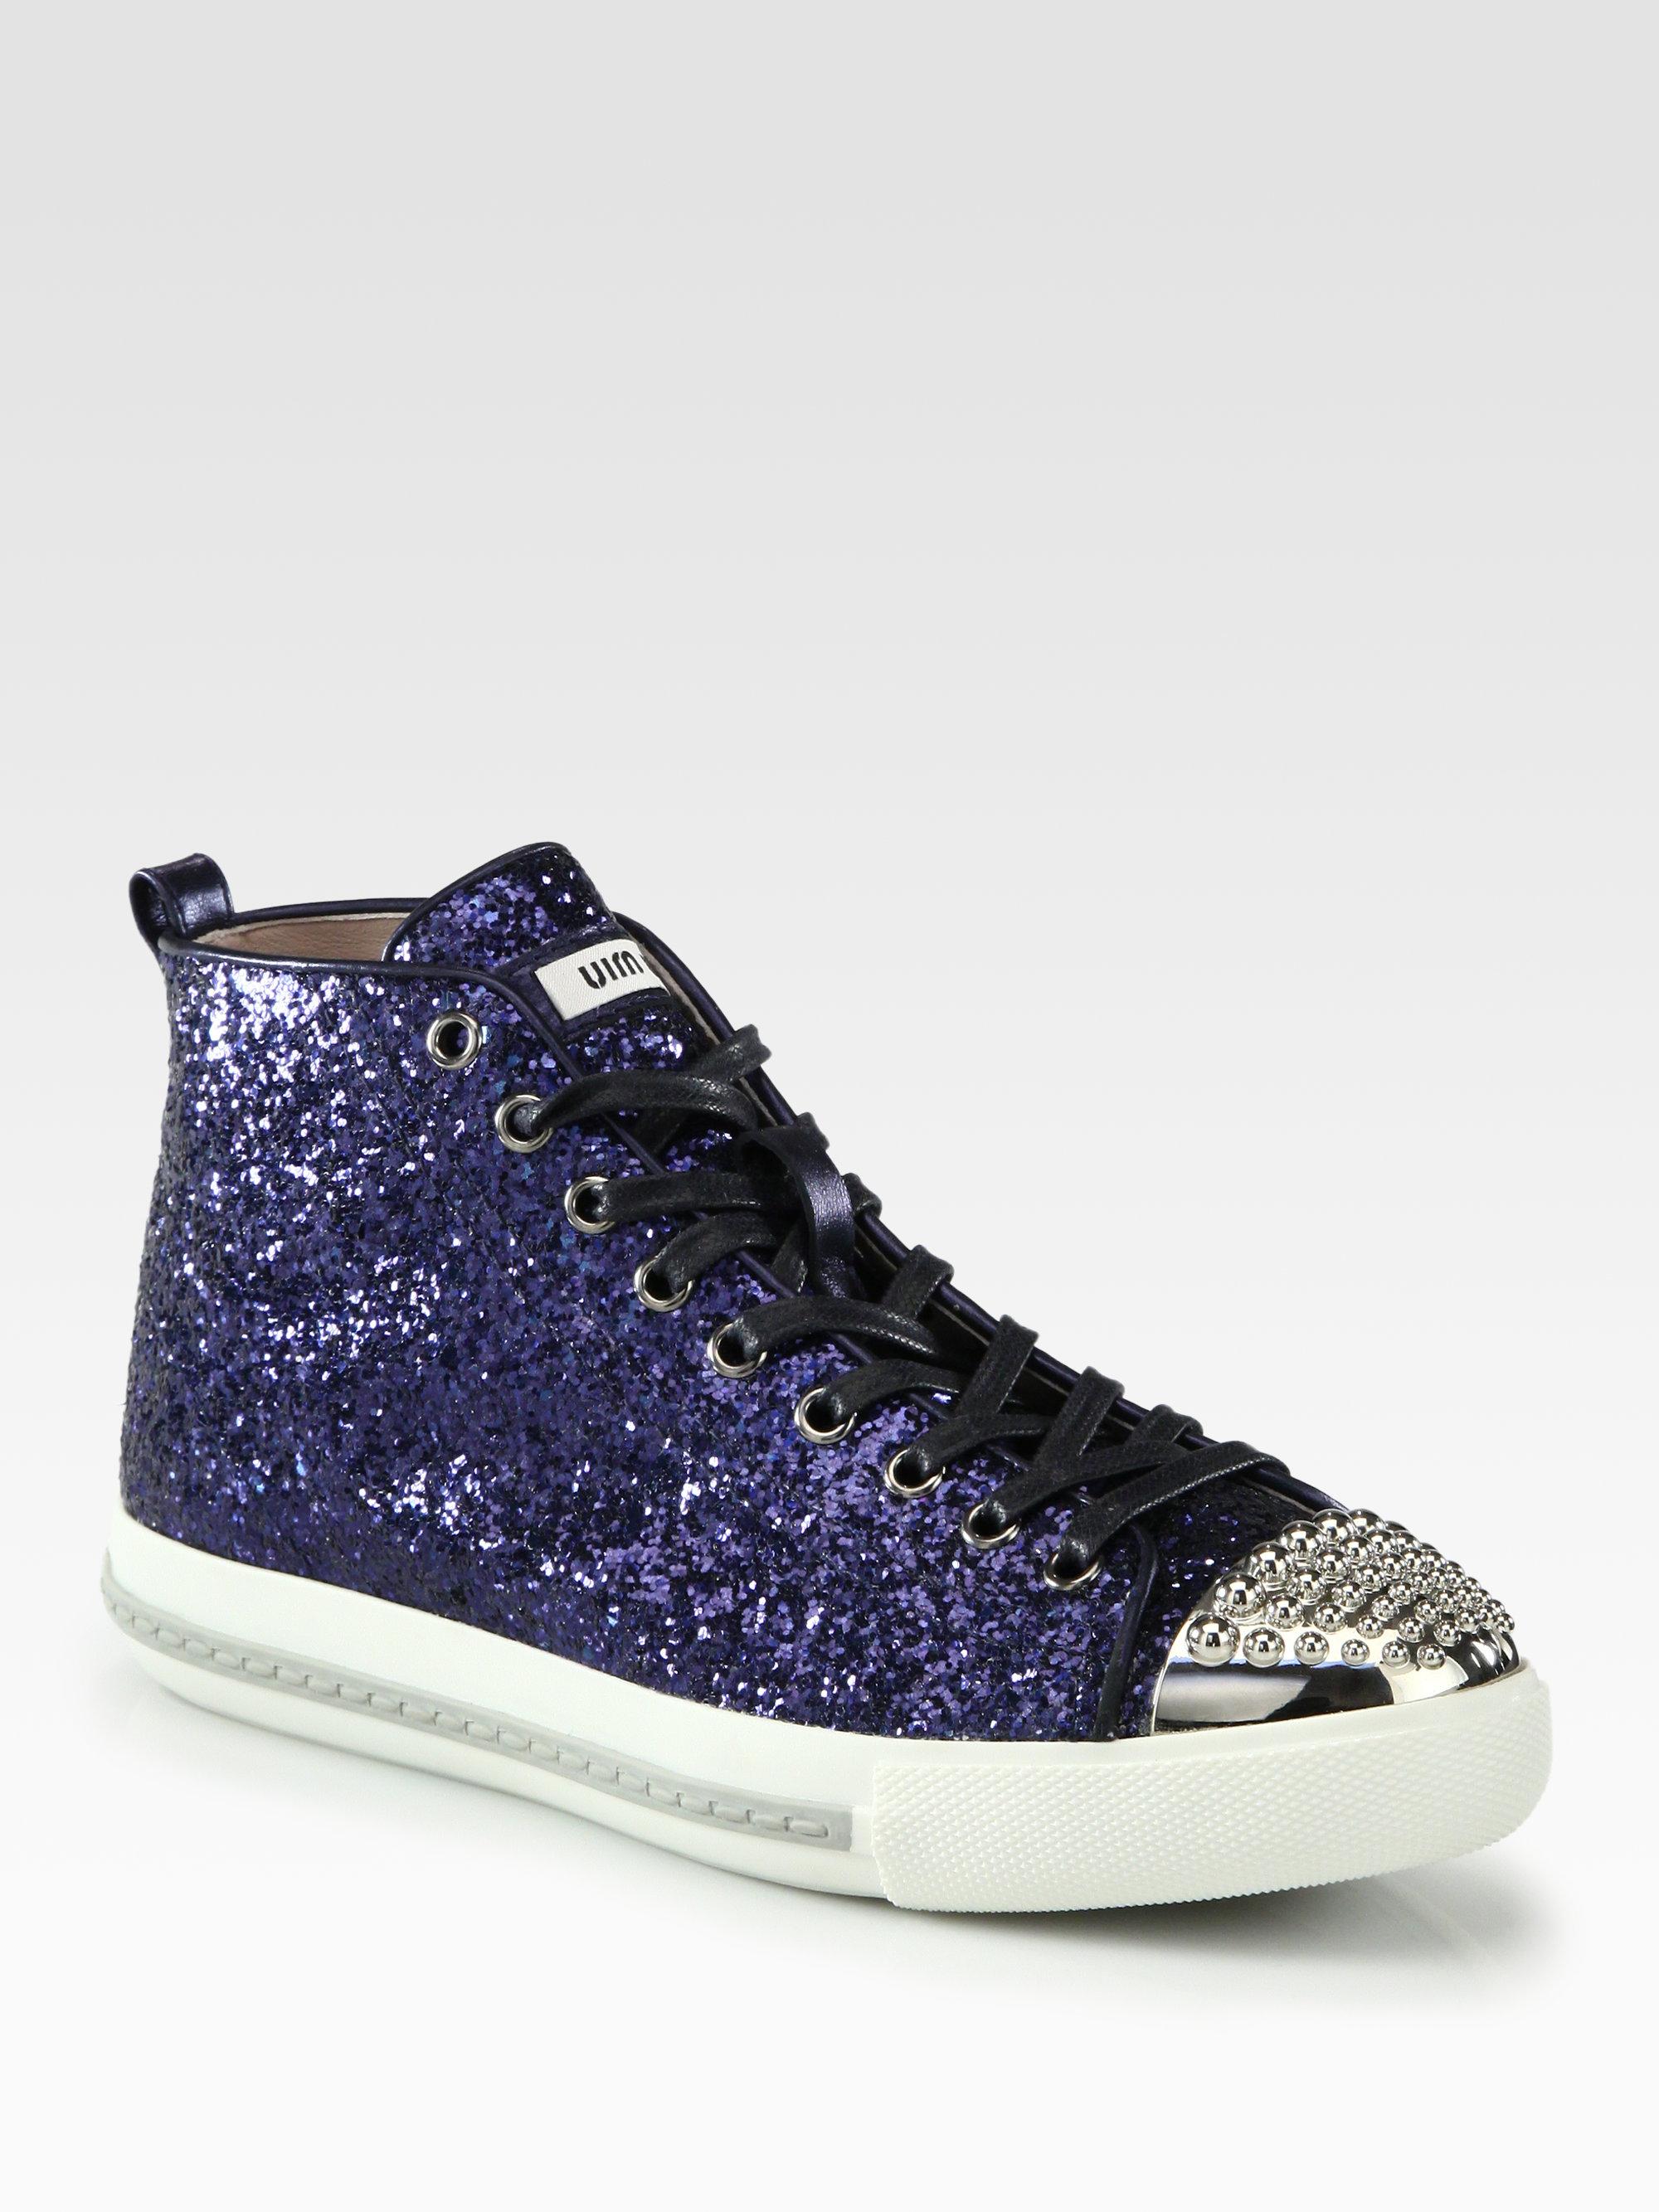 Miu Miu Glitter Low-Top Sneakers discount top quality low cost online buy cheap for sale nbQxDU